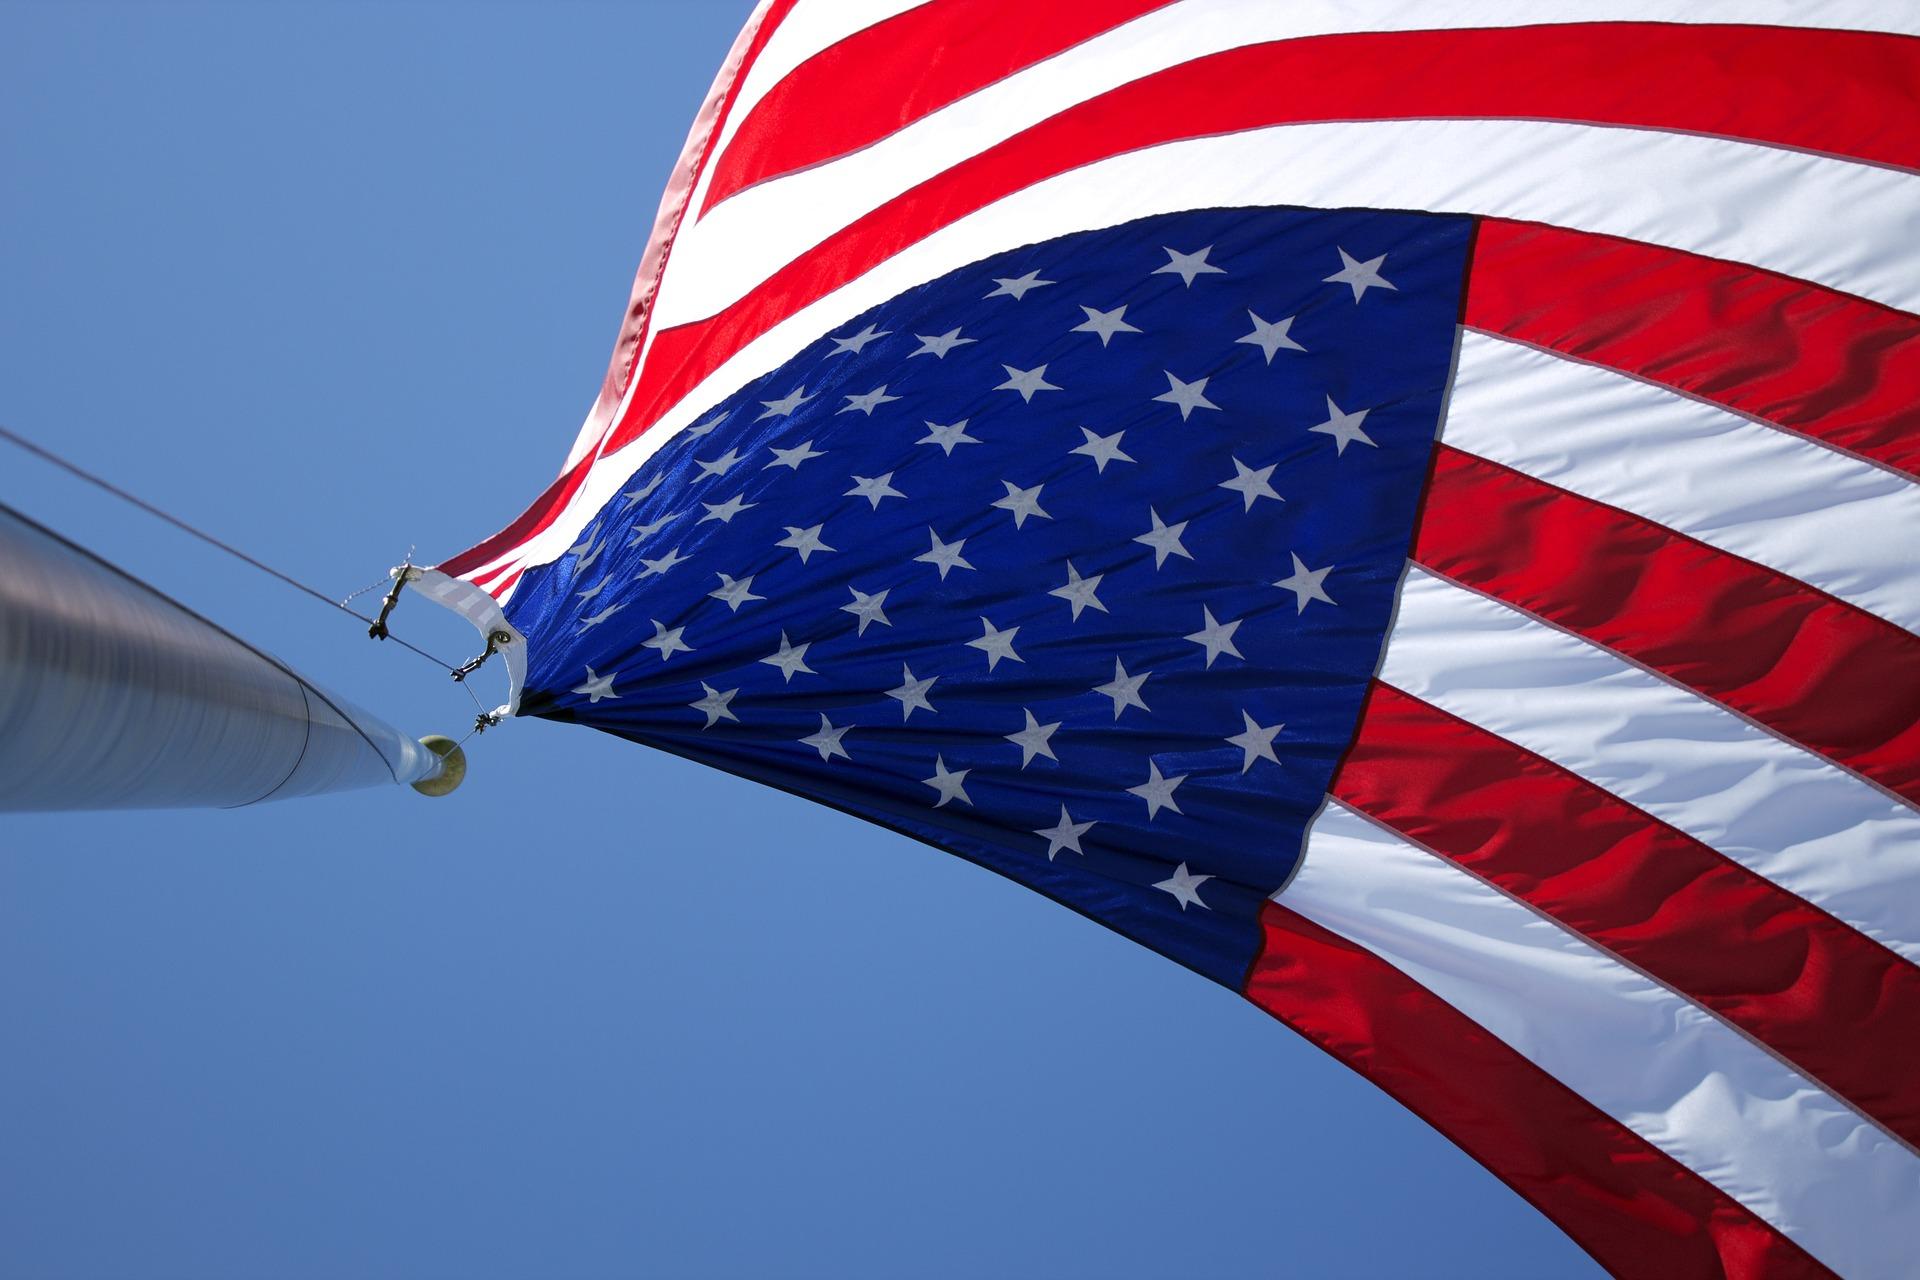 american-flag-1030808_1920.jpg